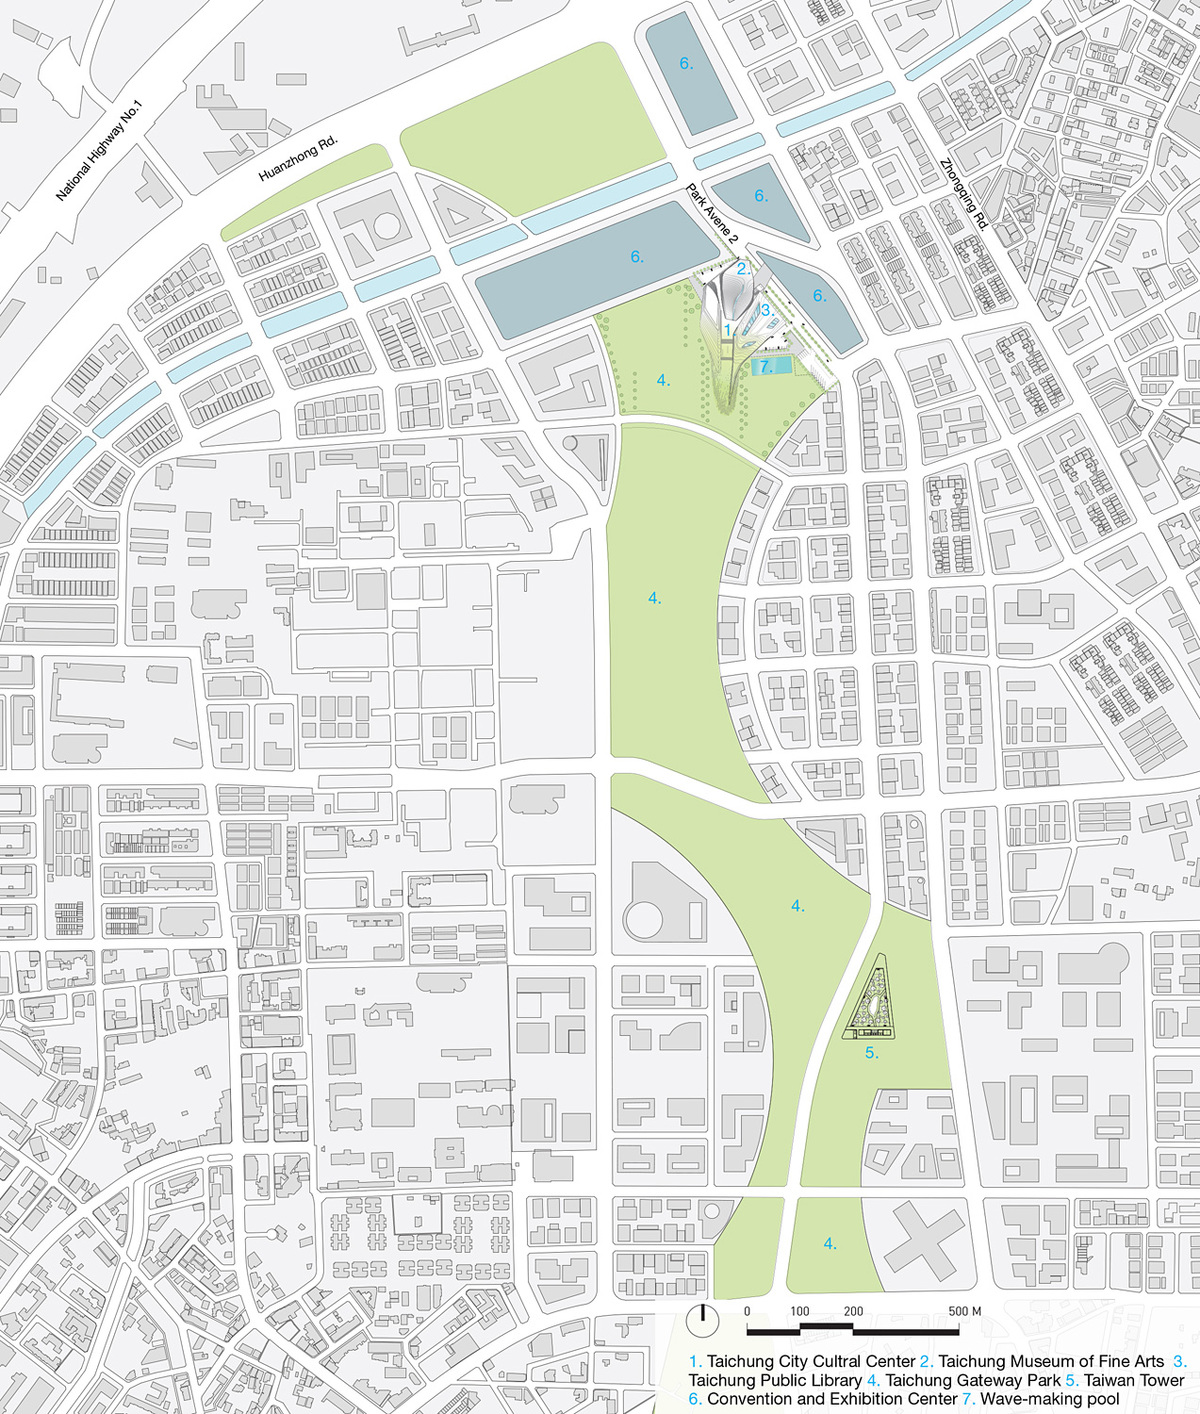 Vicinity site plan 1 (Image: Patrick Tighe Architecture)